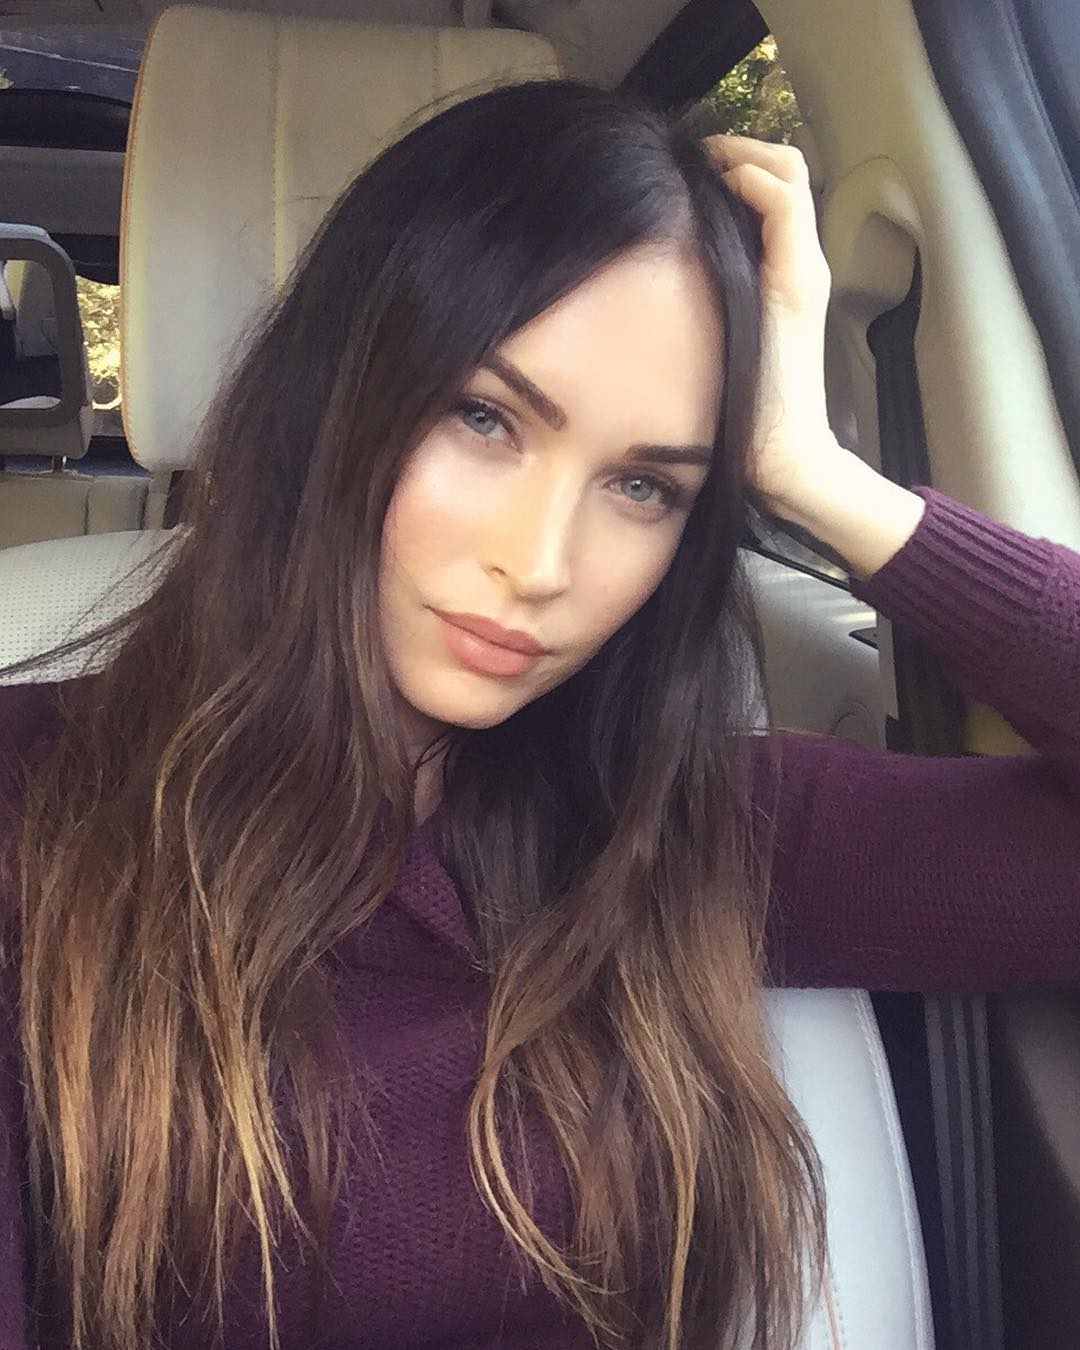 Megan-Fox-Wallpapers-Insta-Fit-Bio-13